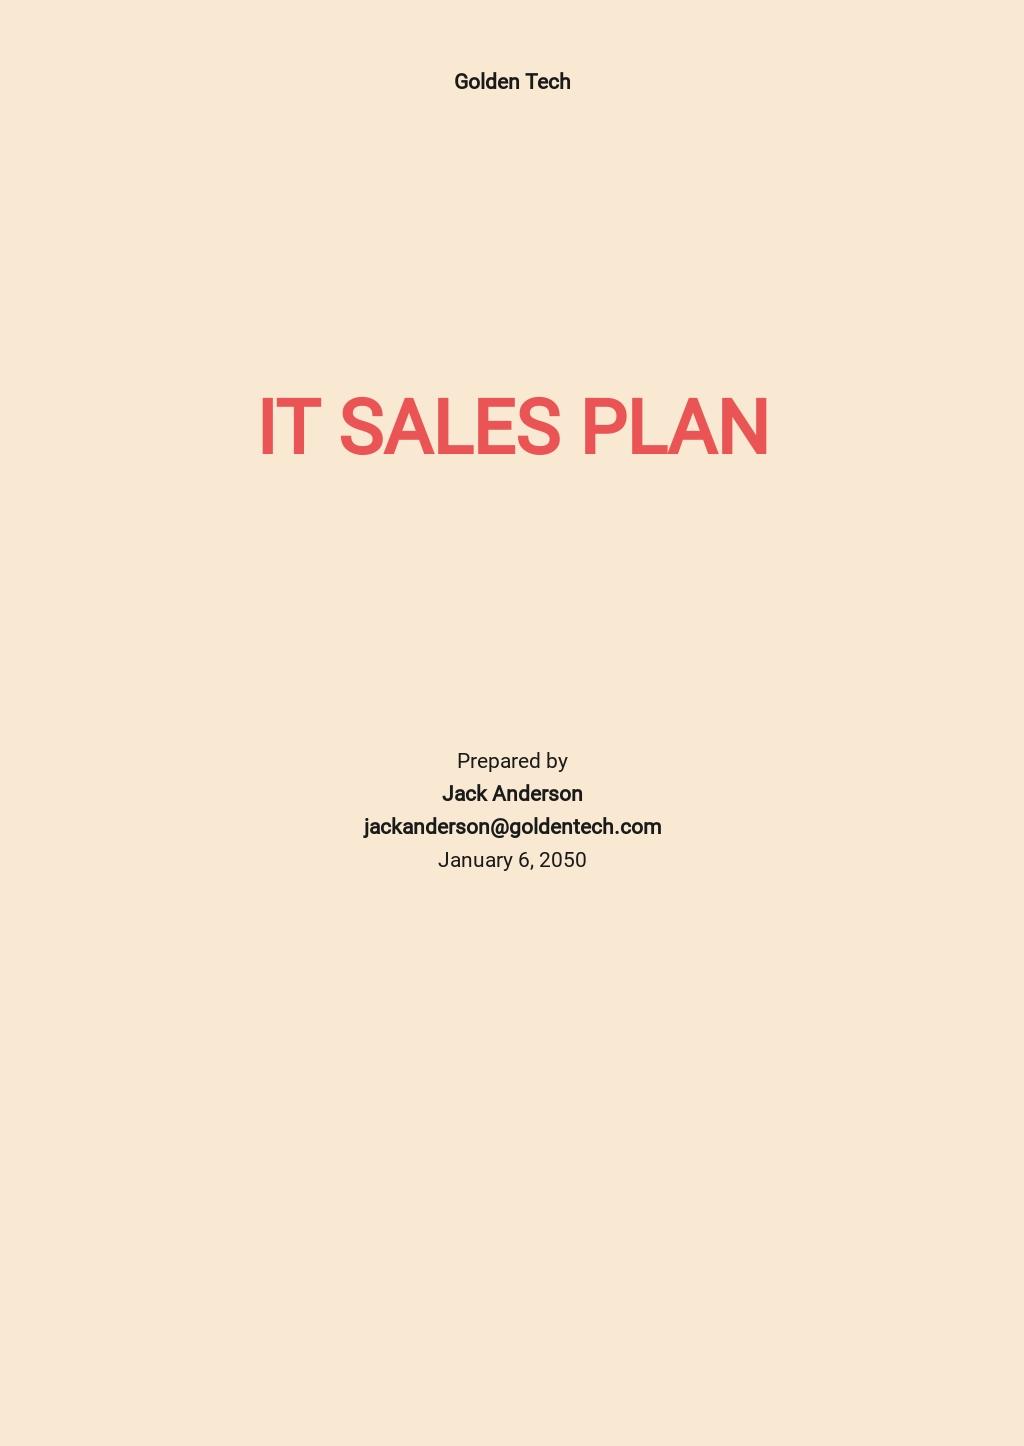 Sample IT Sales Plan Template